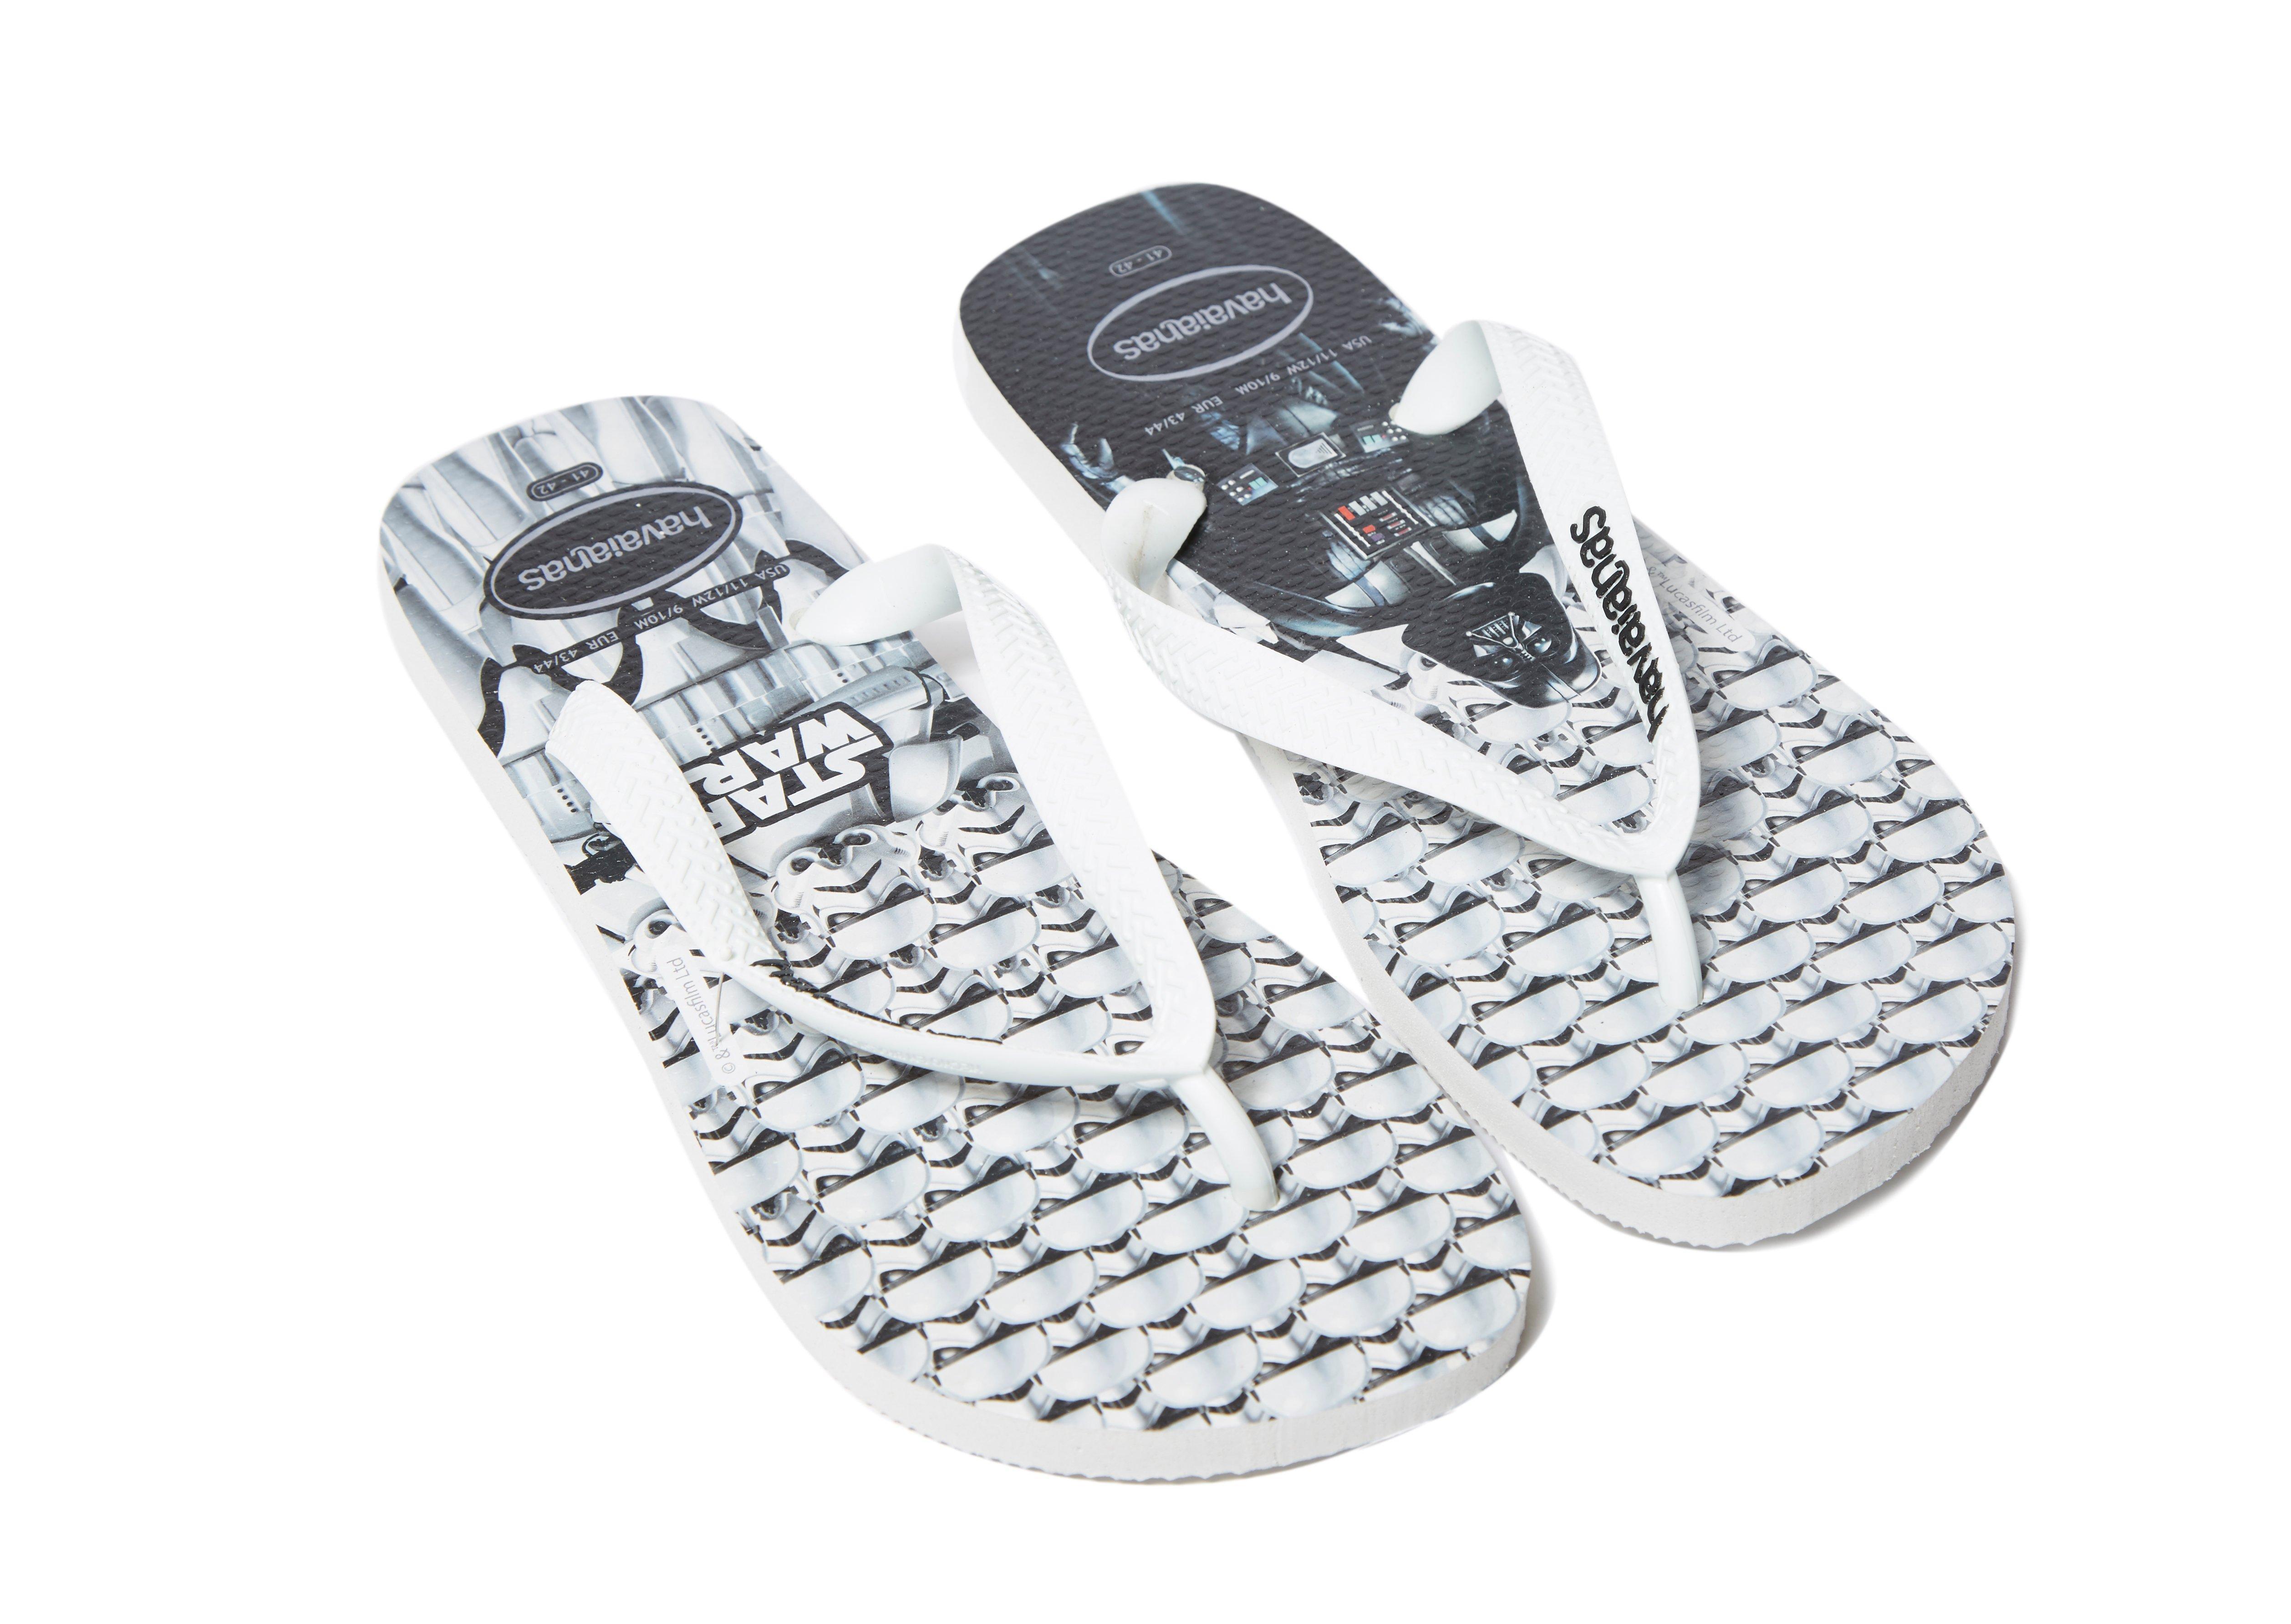 938c874f69d6a8 Lyst - Havaianas Star Wars Flip Flops in White for Men